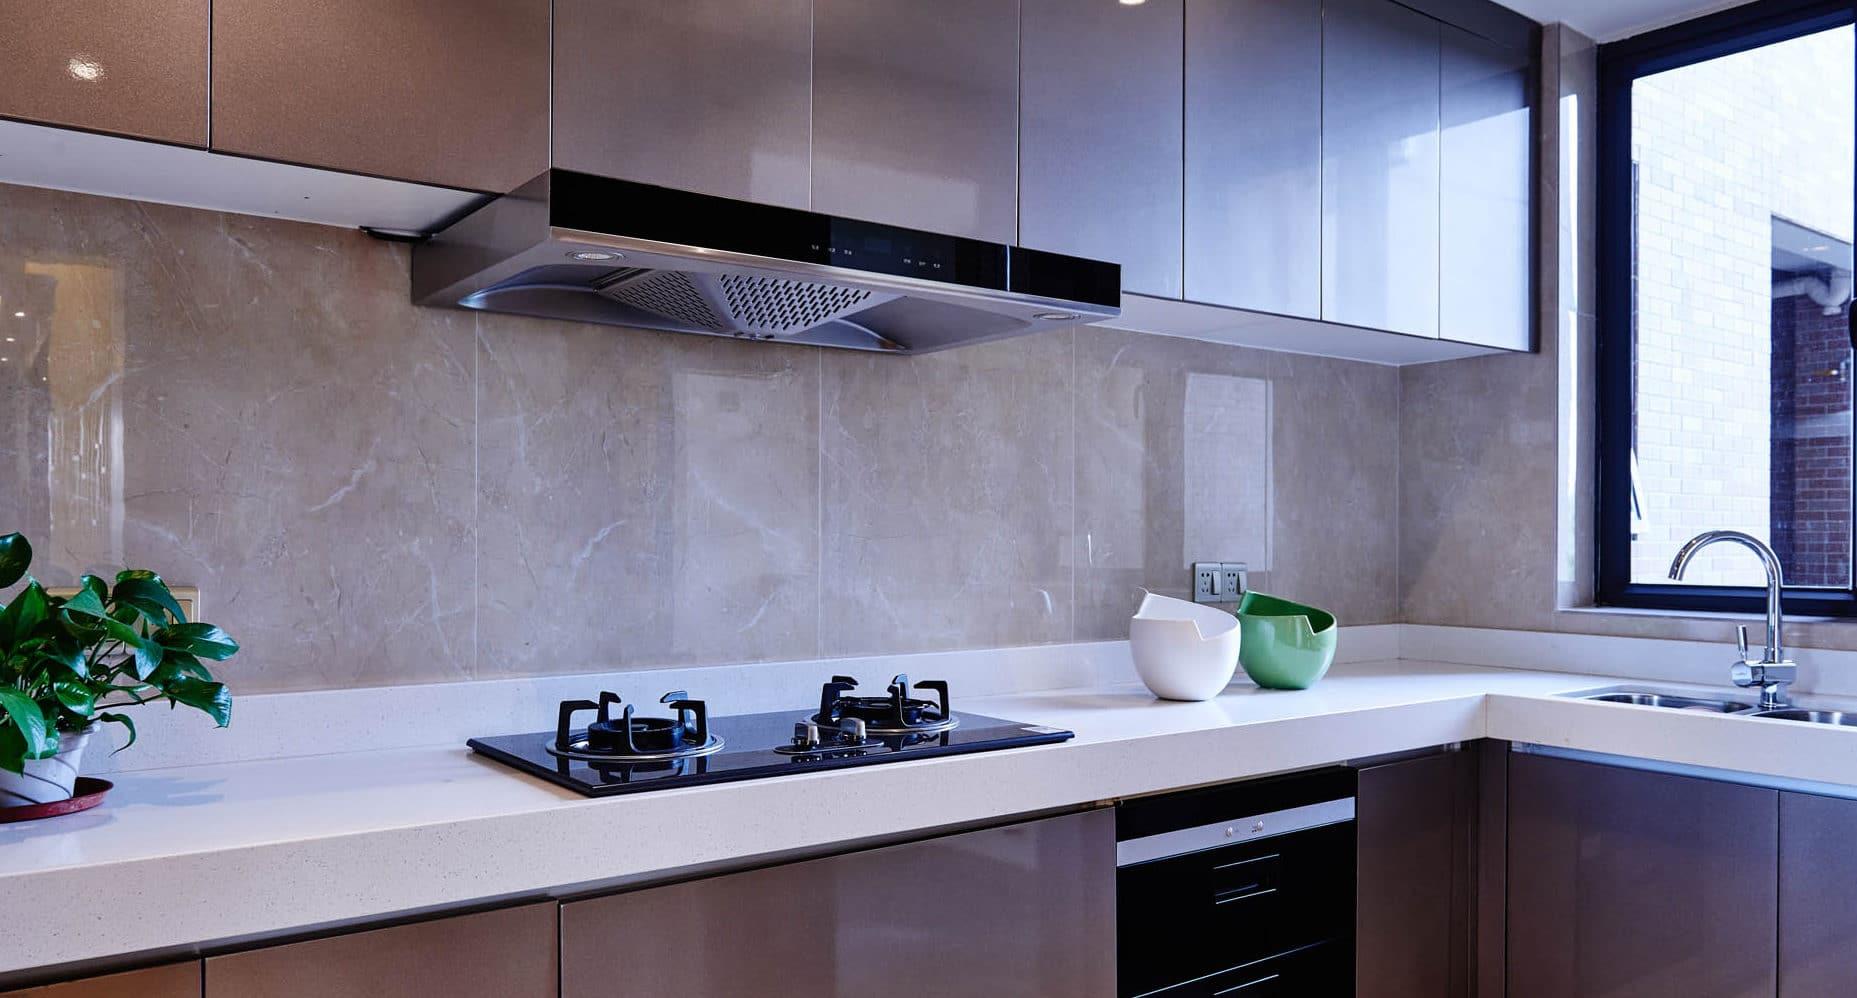 Cmo elegir azulejos para cocinas  Murelli Cucine